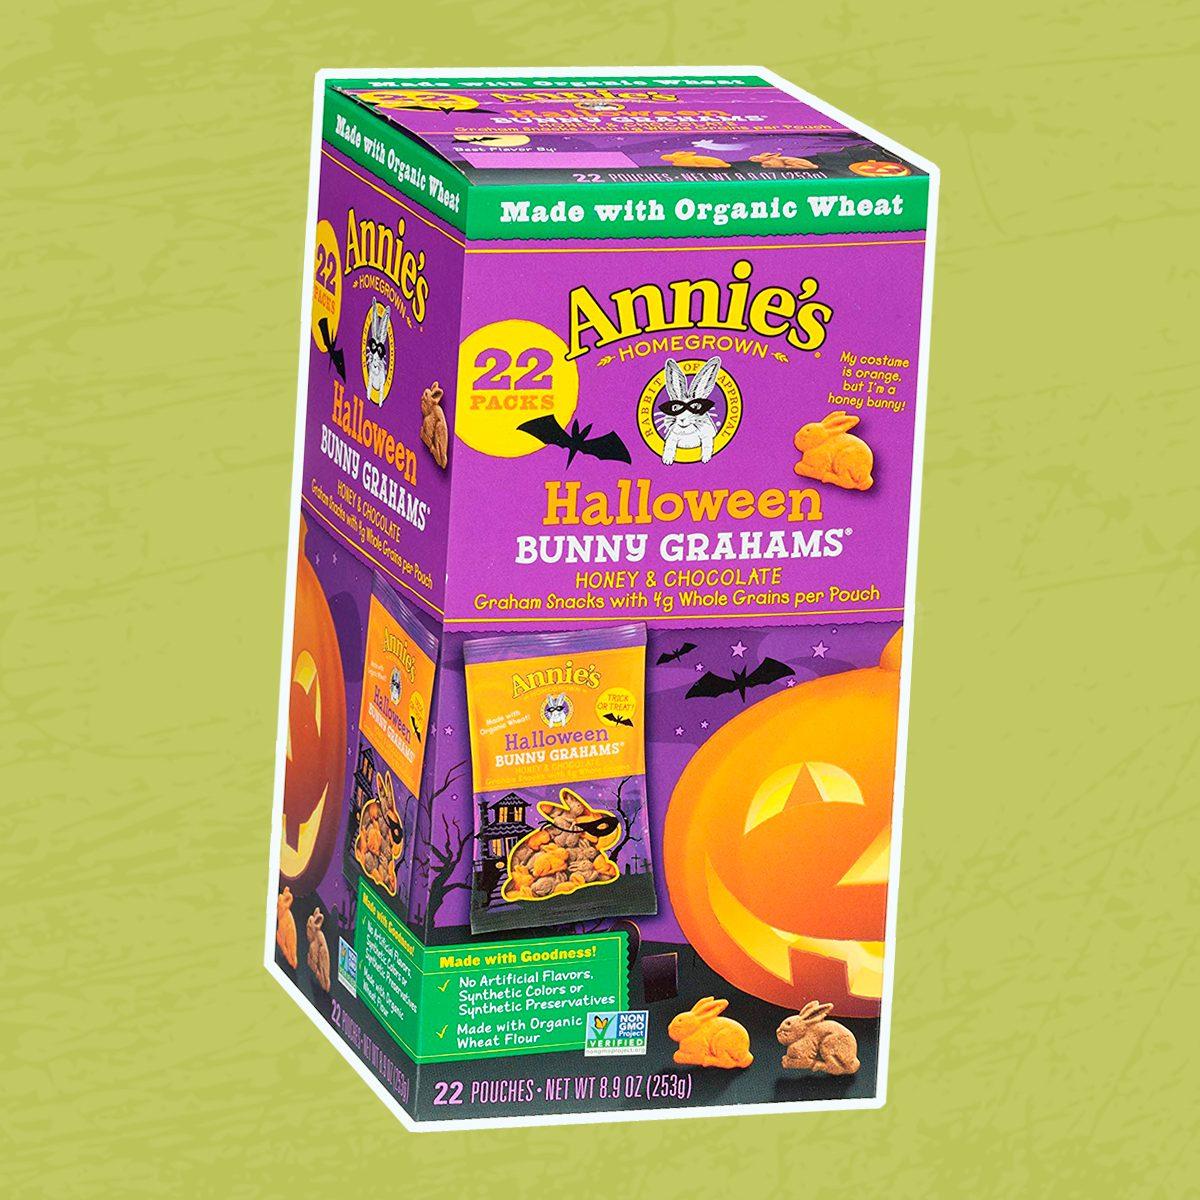 Annie's Halloween Bunny Whole Grain Graham Snacks, Honey and Chocolate